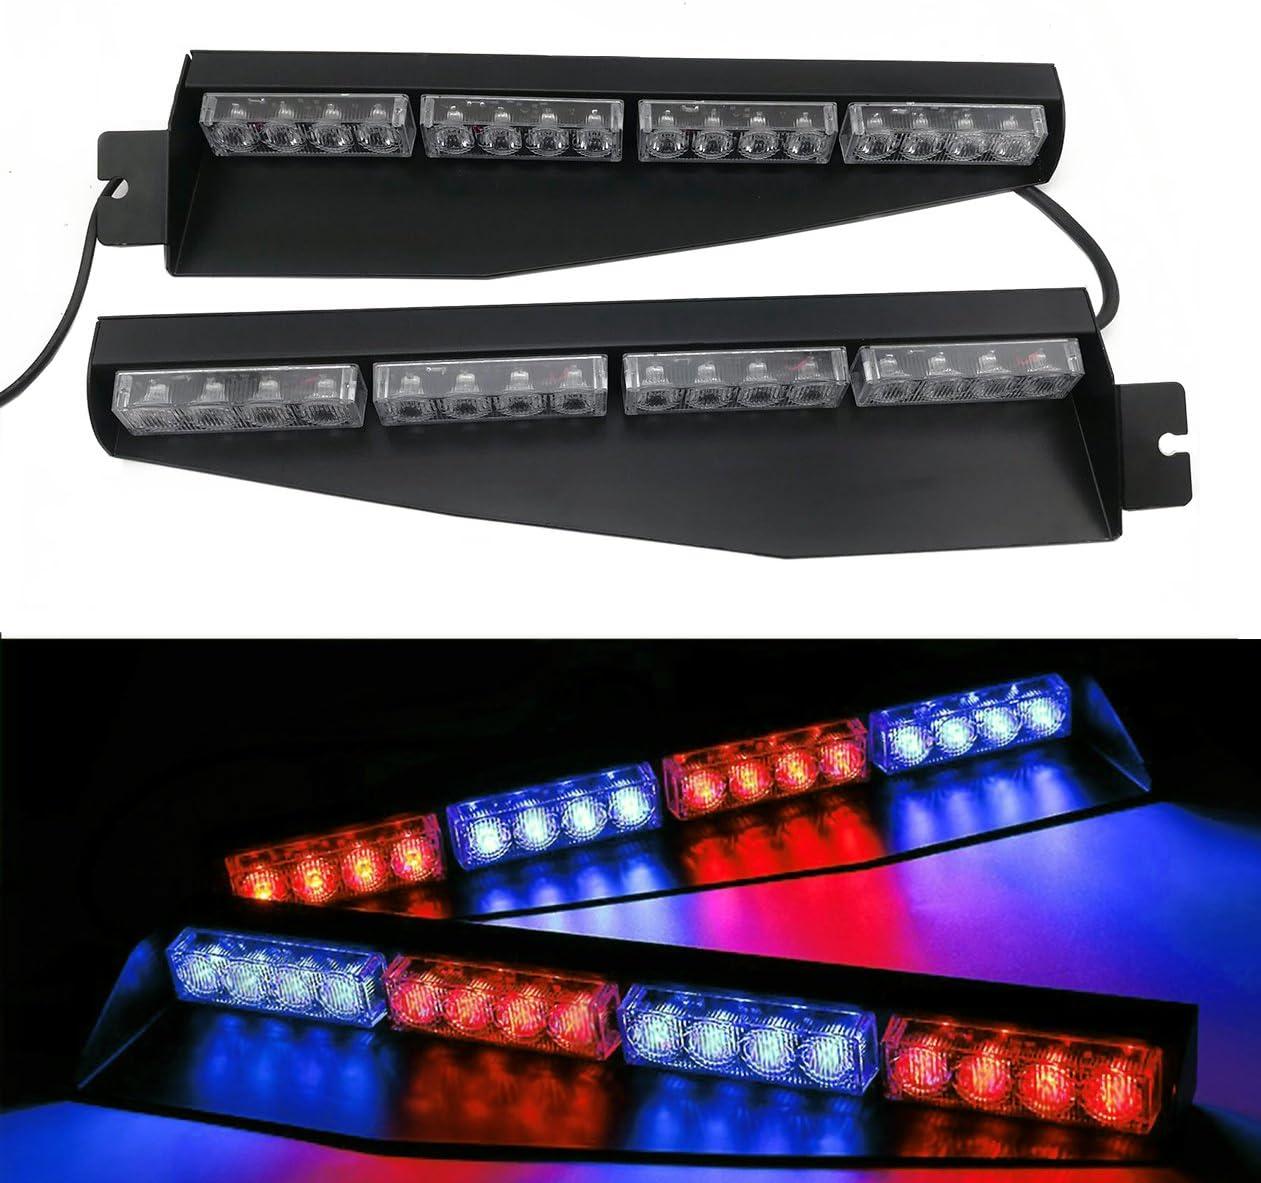 TASWK 32LED 32W LED Lightbar Emergency Windshield Light Sales for sale Ha Visor Quantity limited